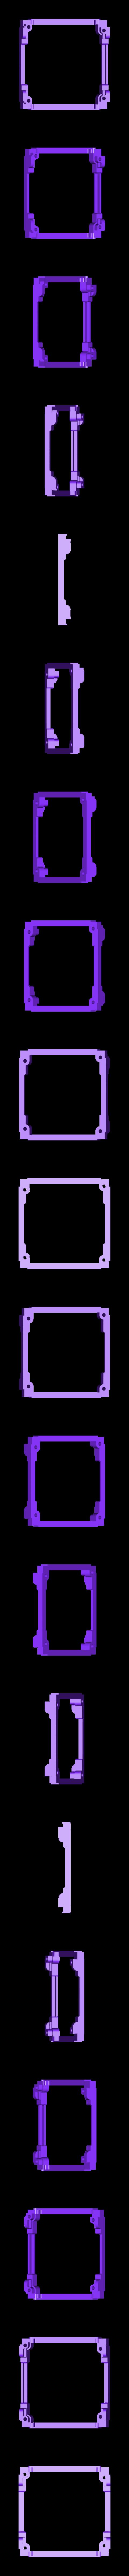 Frame_UpperPlate.stl Download free STL file ArduSat • 3D printing template, Loustic3D888